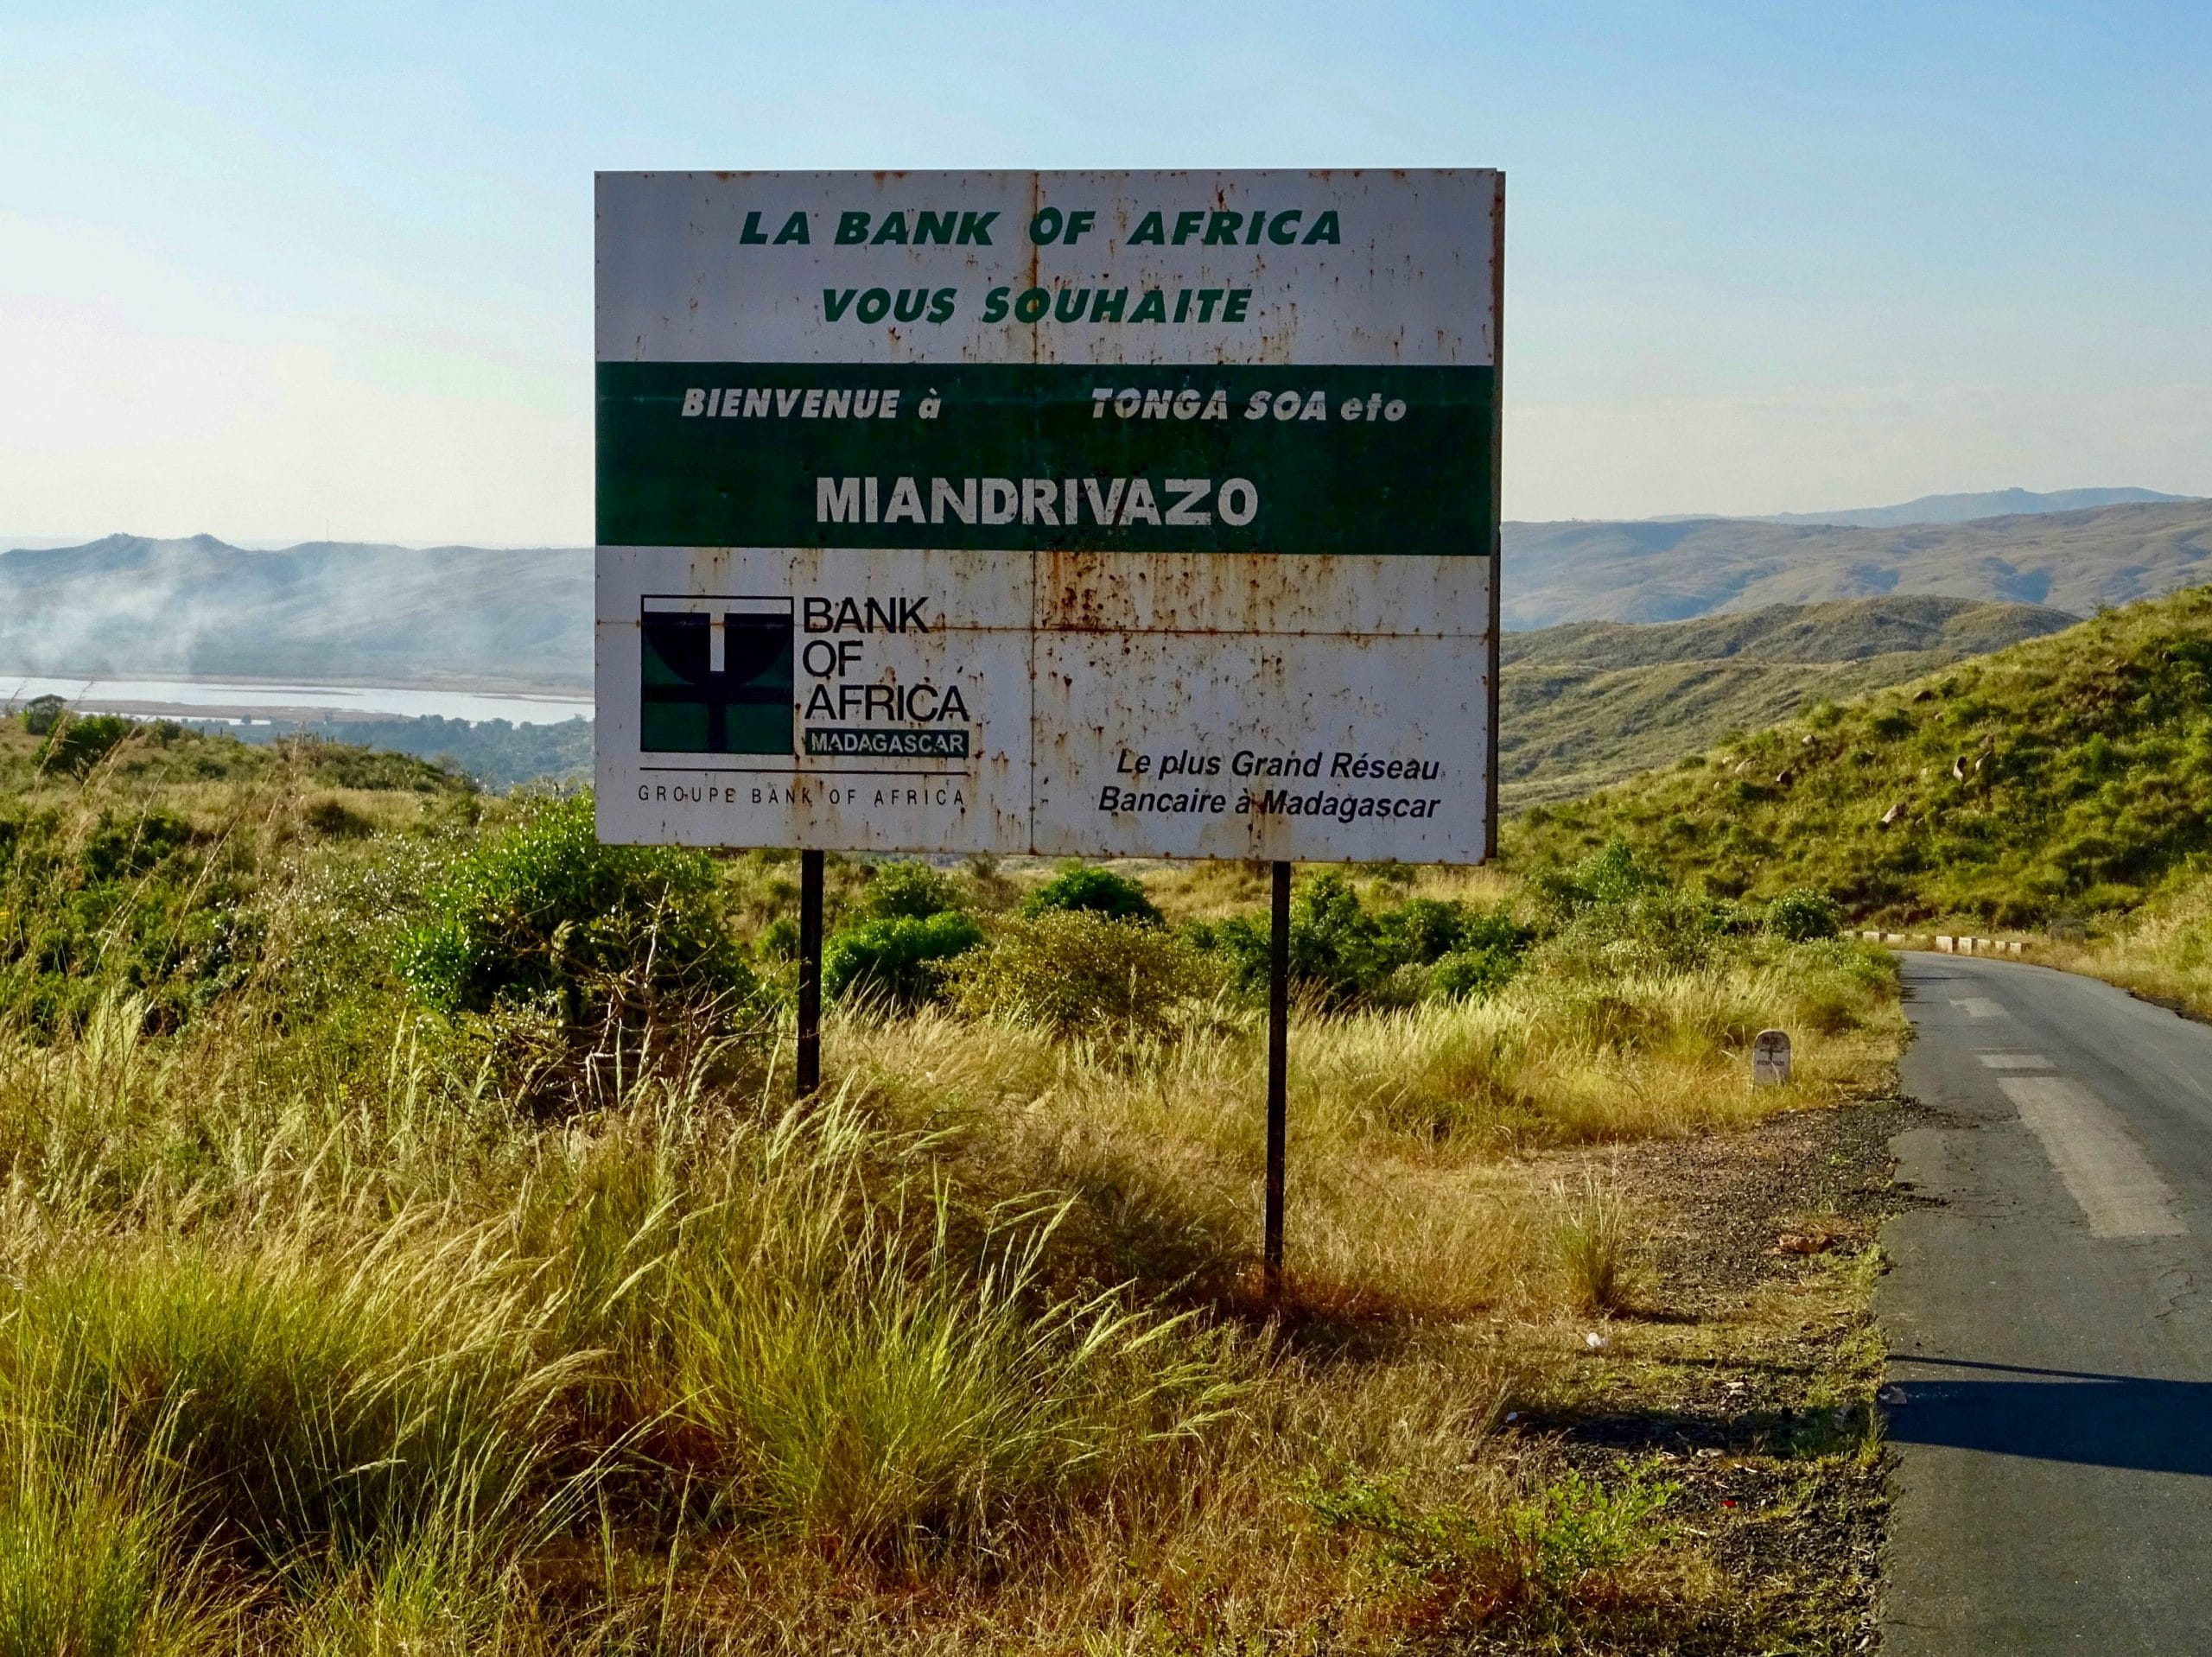 Bank of Africa billboard welkom in Miandrivazo